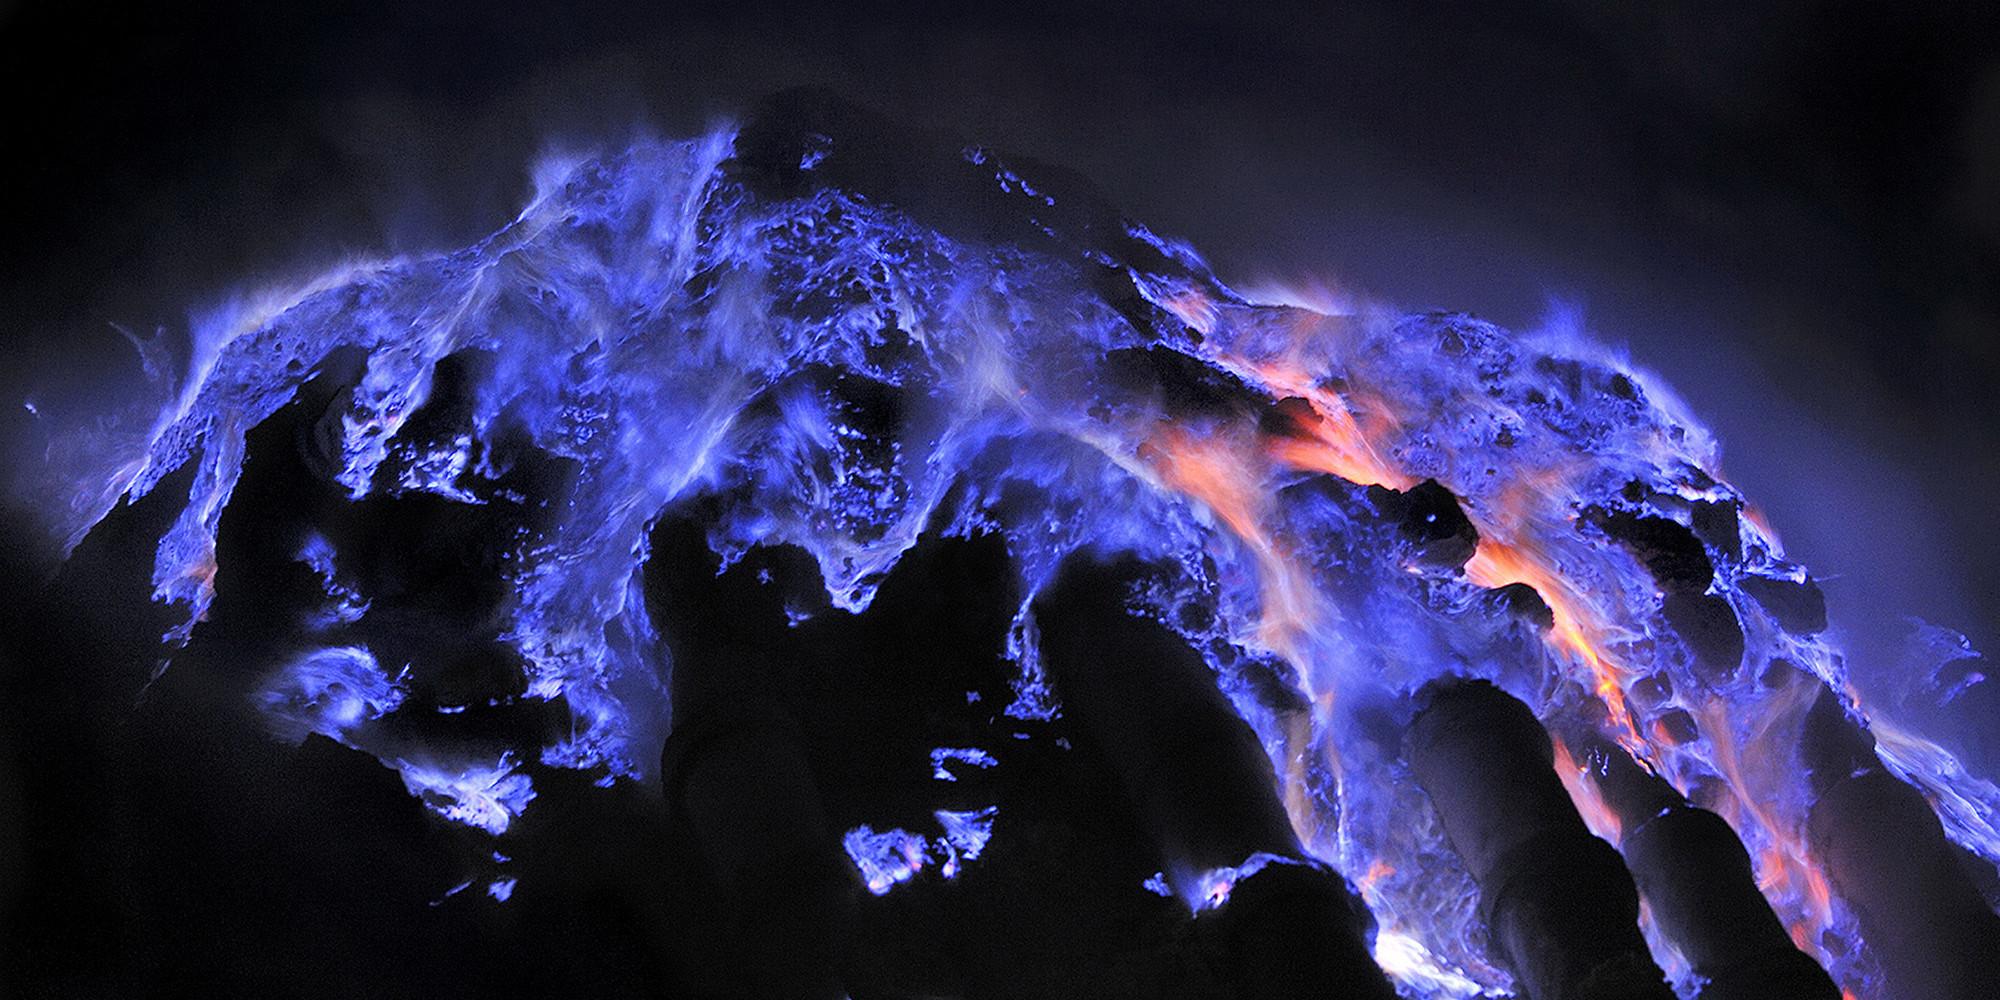 blue-lava-kawah-ijen-volcano-woe1.jpg